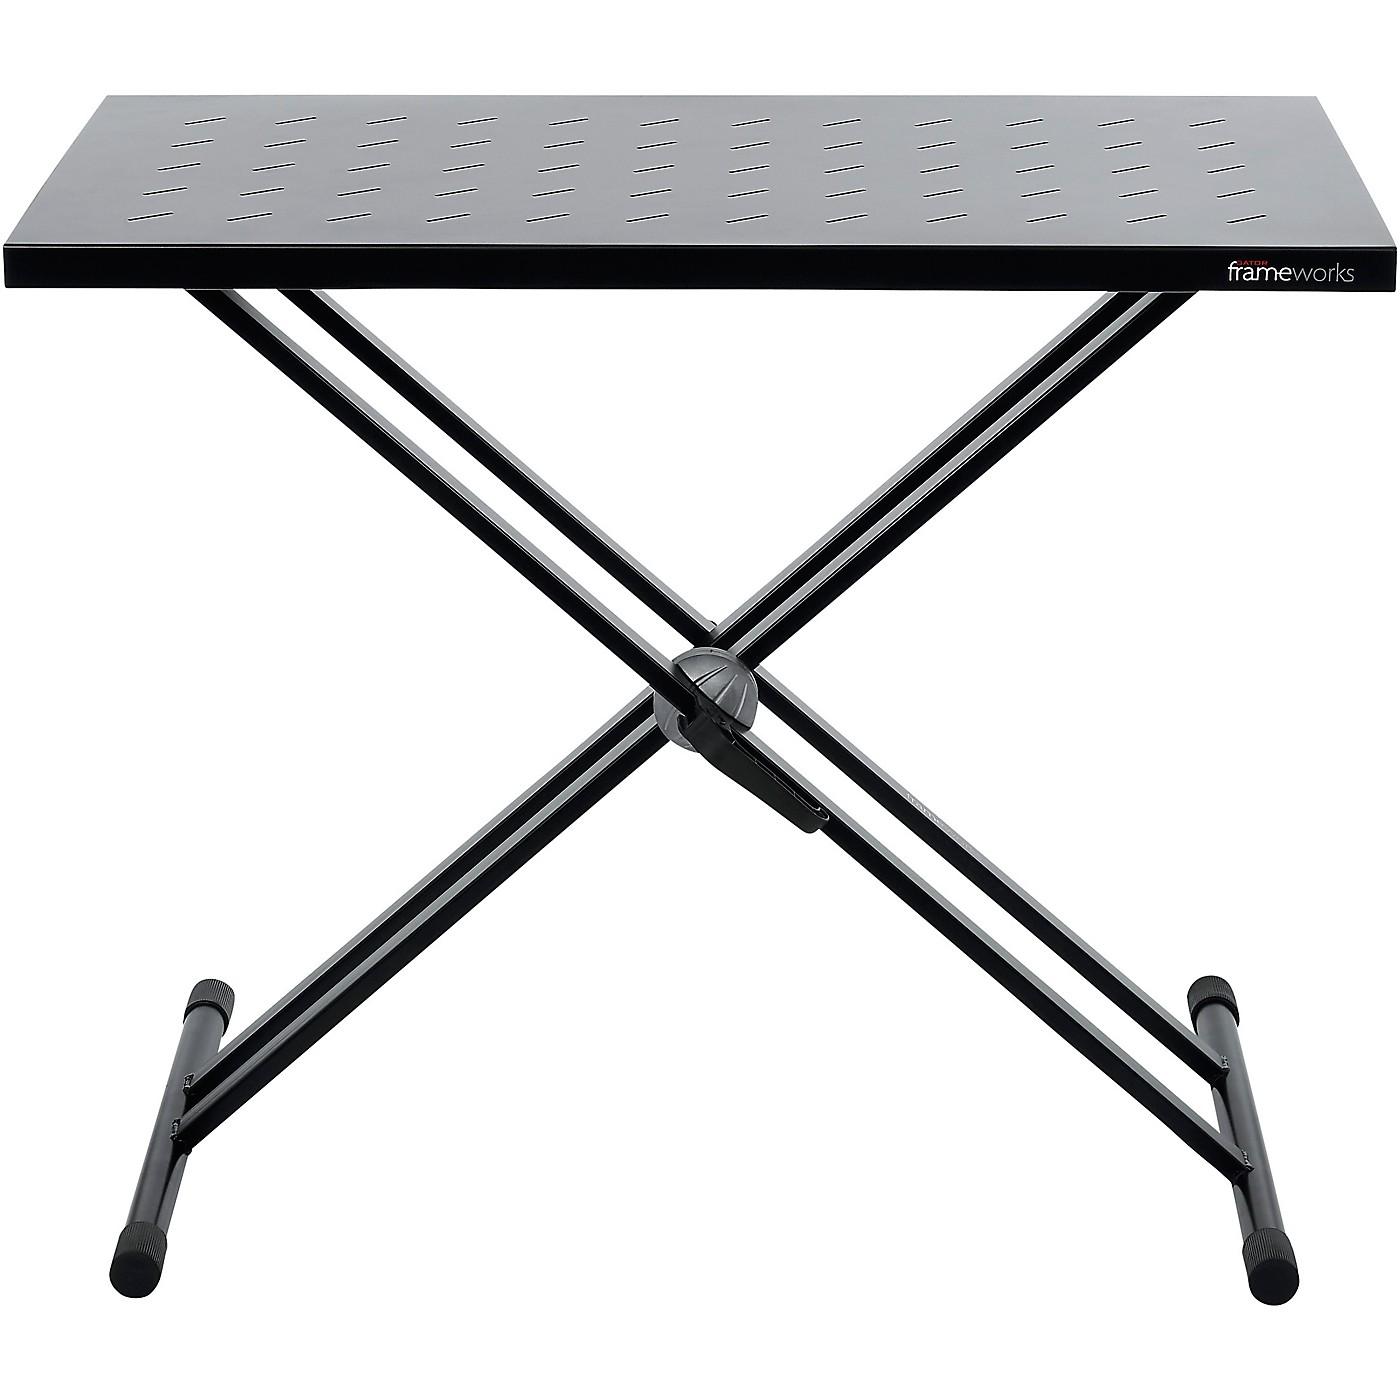 Gator GFW-UTL-XSTDTBLTOPSET Utility table top with double-X stand thumbnail